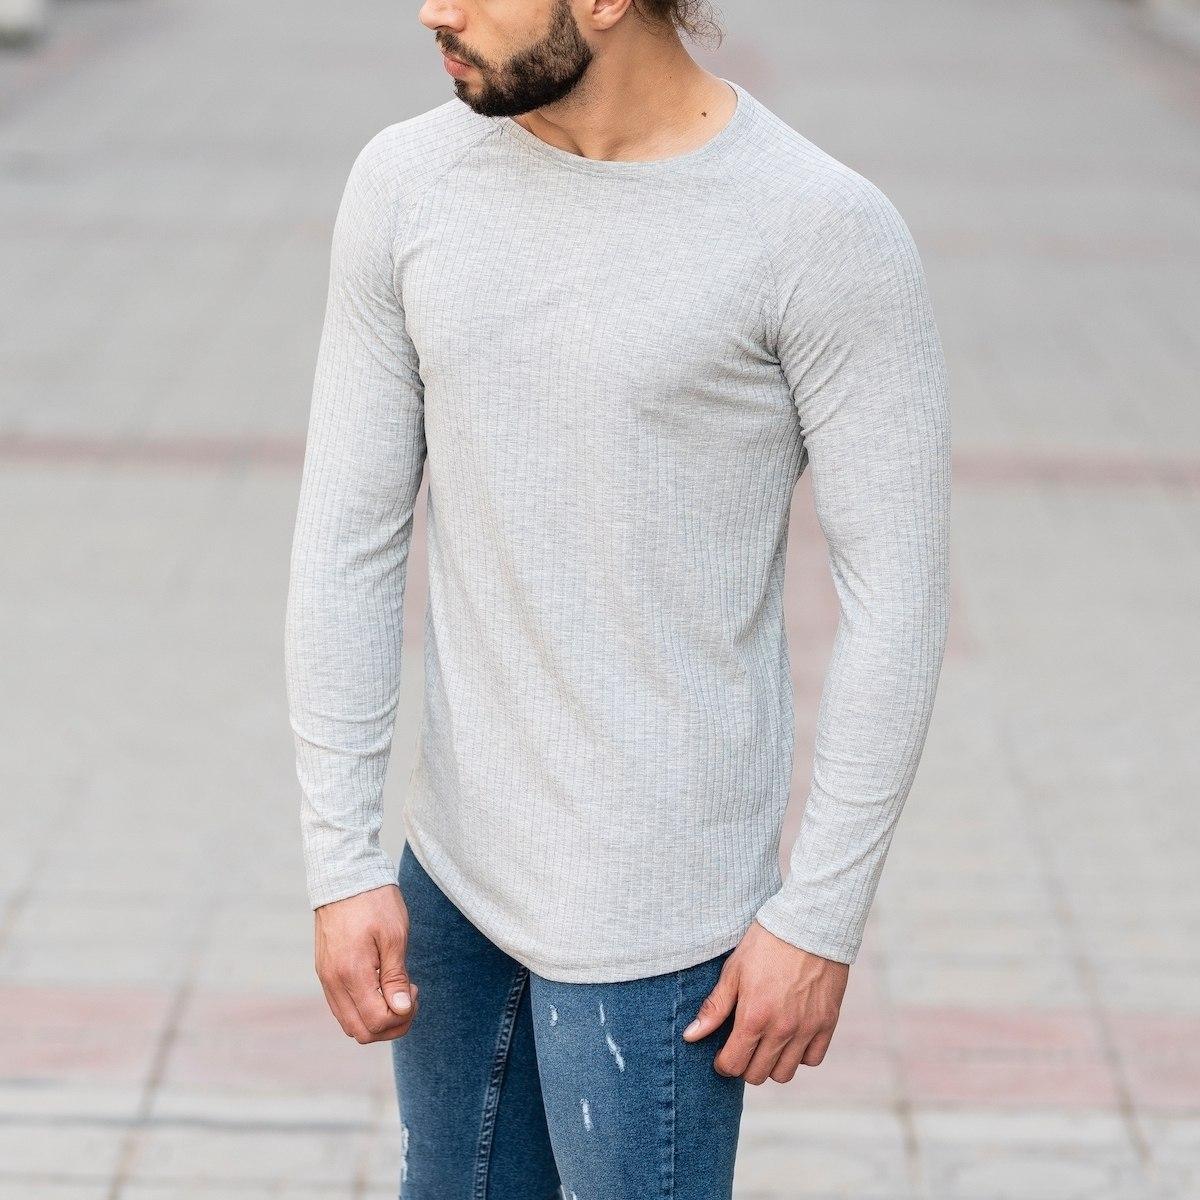 Stone Gray Sweatshirt With Stripe Details Mv Premium Brand - 3